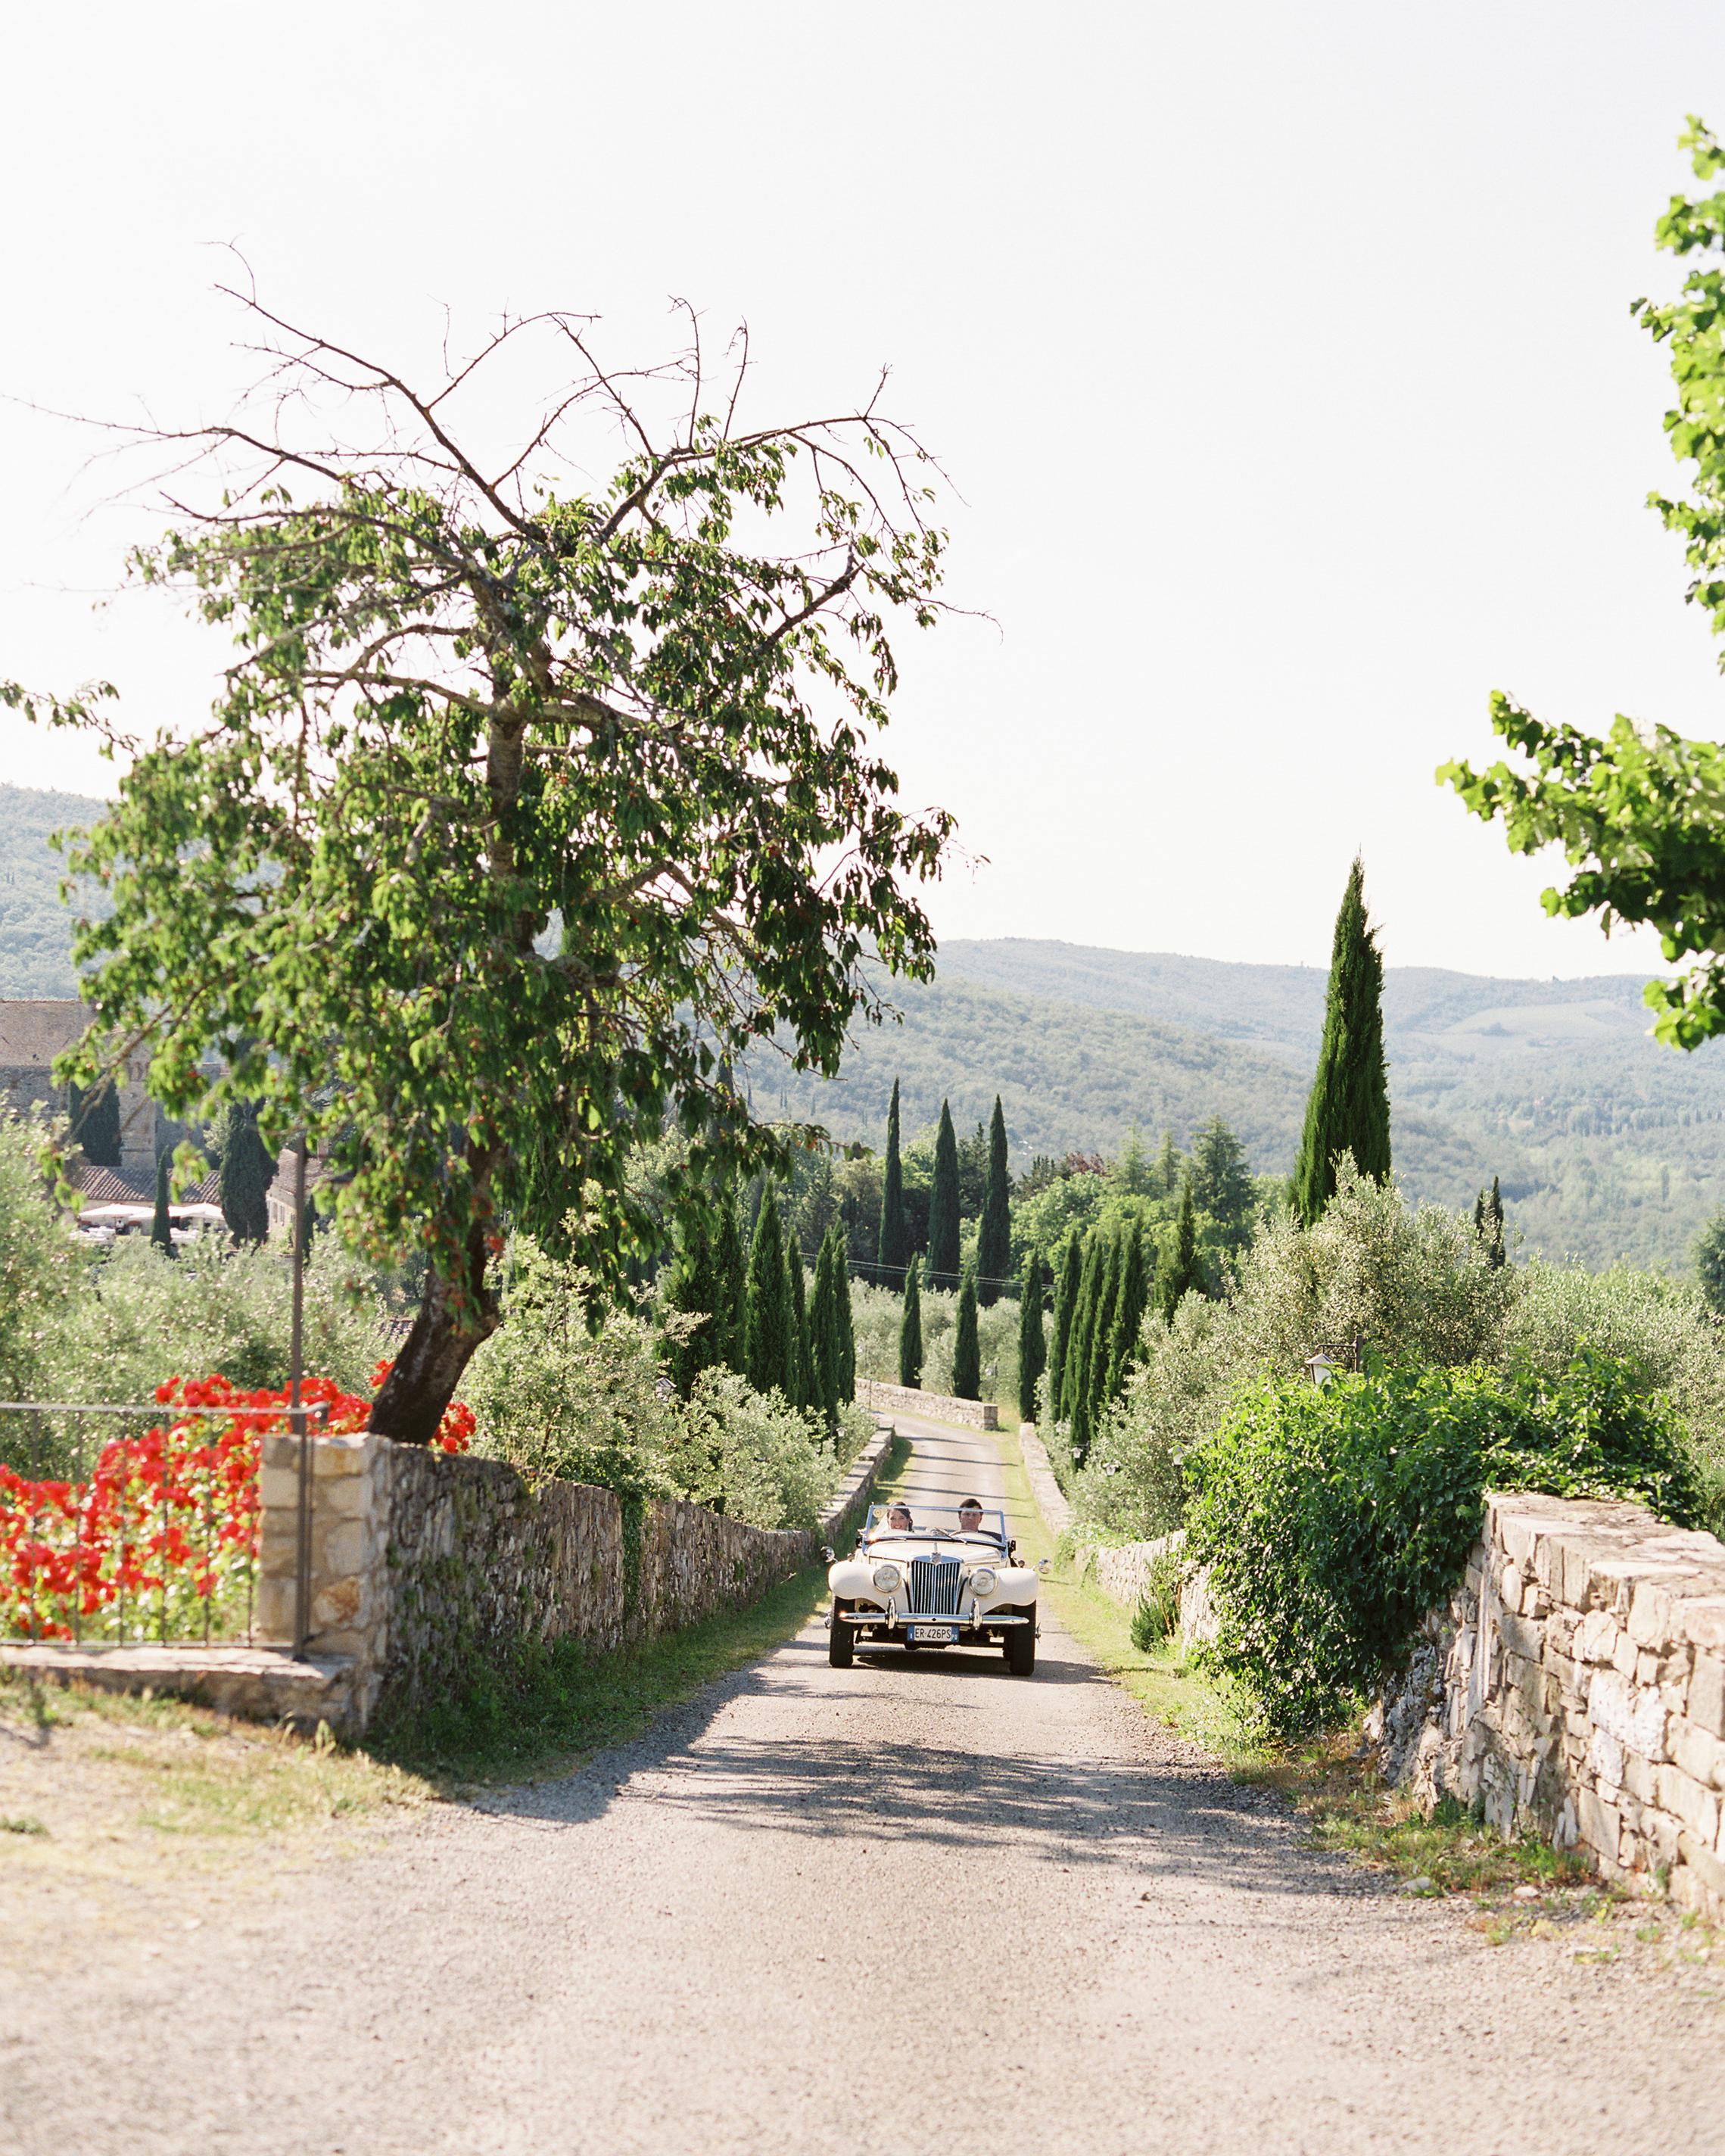 lauren-ollie-wedding-car-211-s111895-0515.jpg